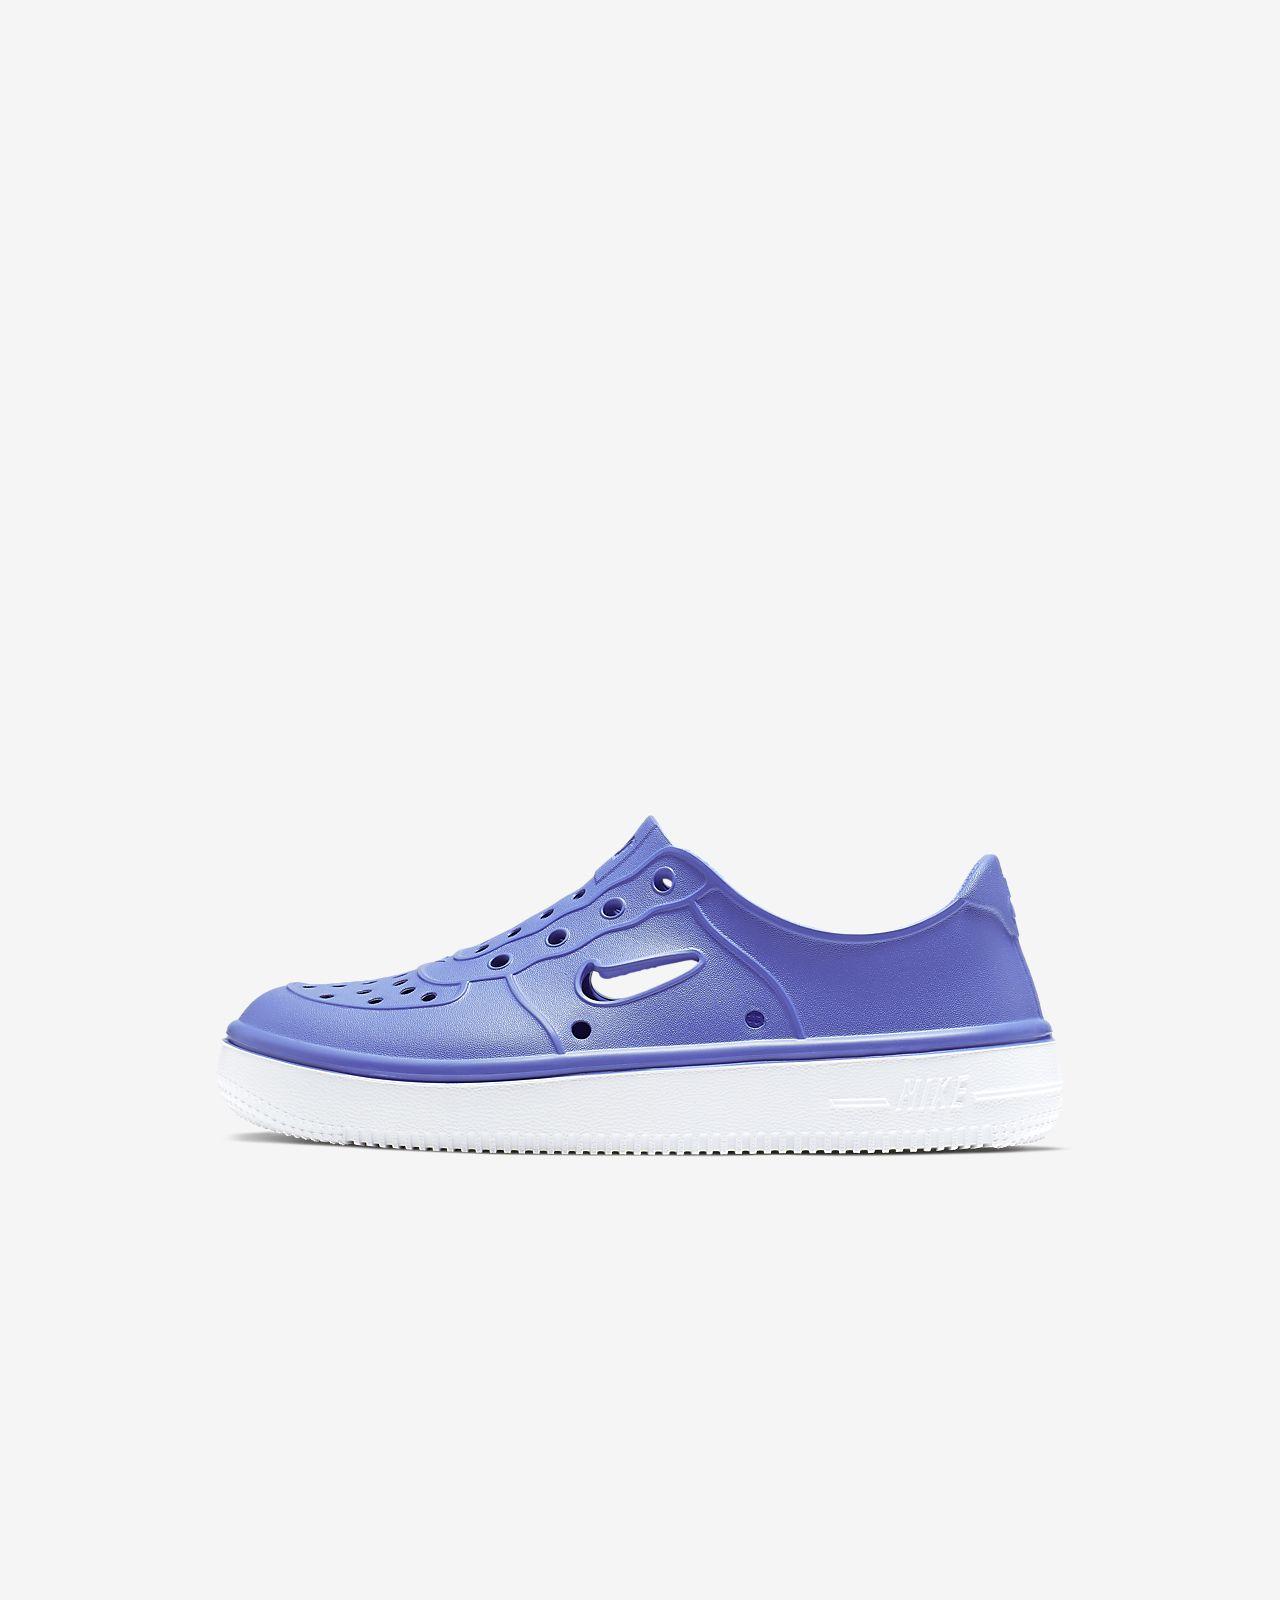 cbc2dd40 Кроссовки для дошкольников Nike Foam Force 1. Nike.com RU